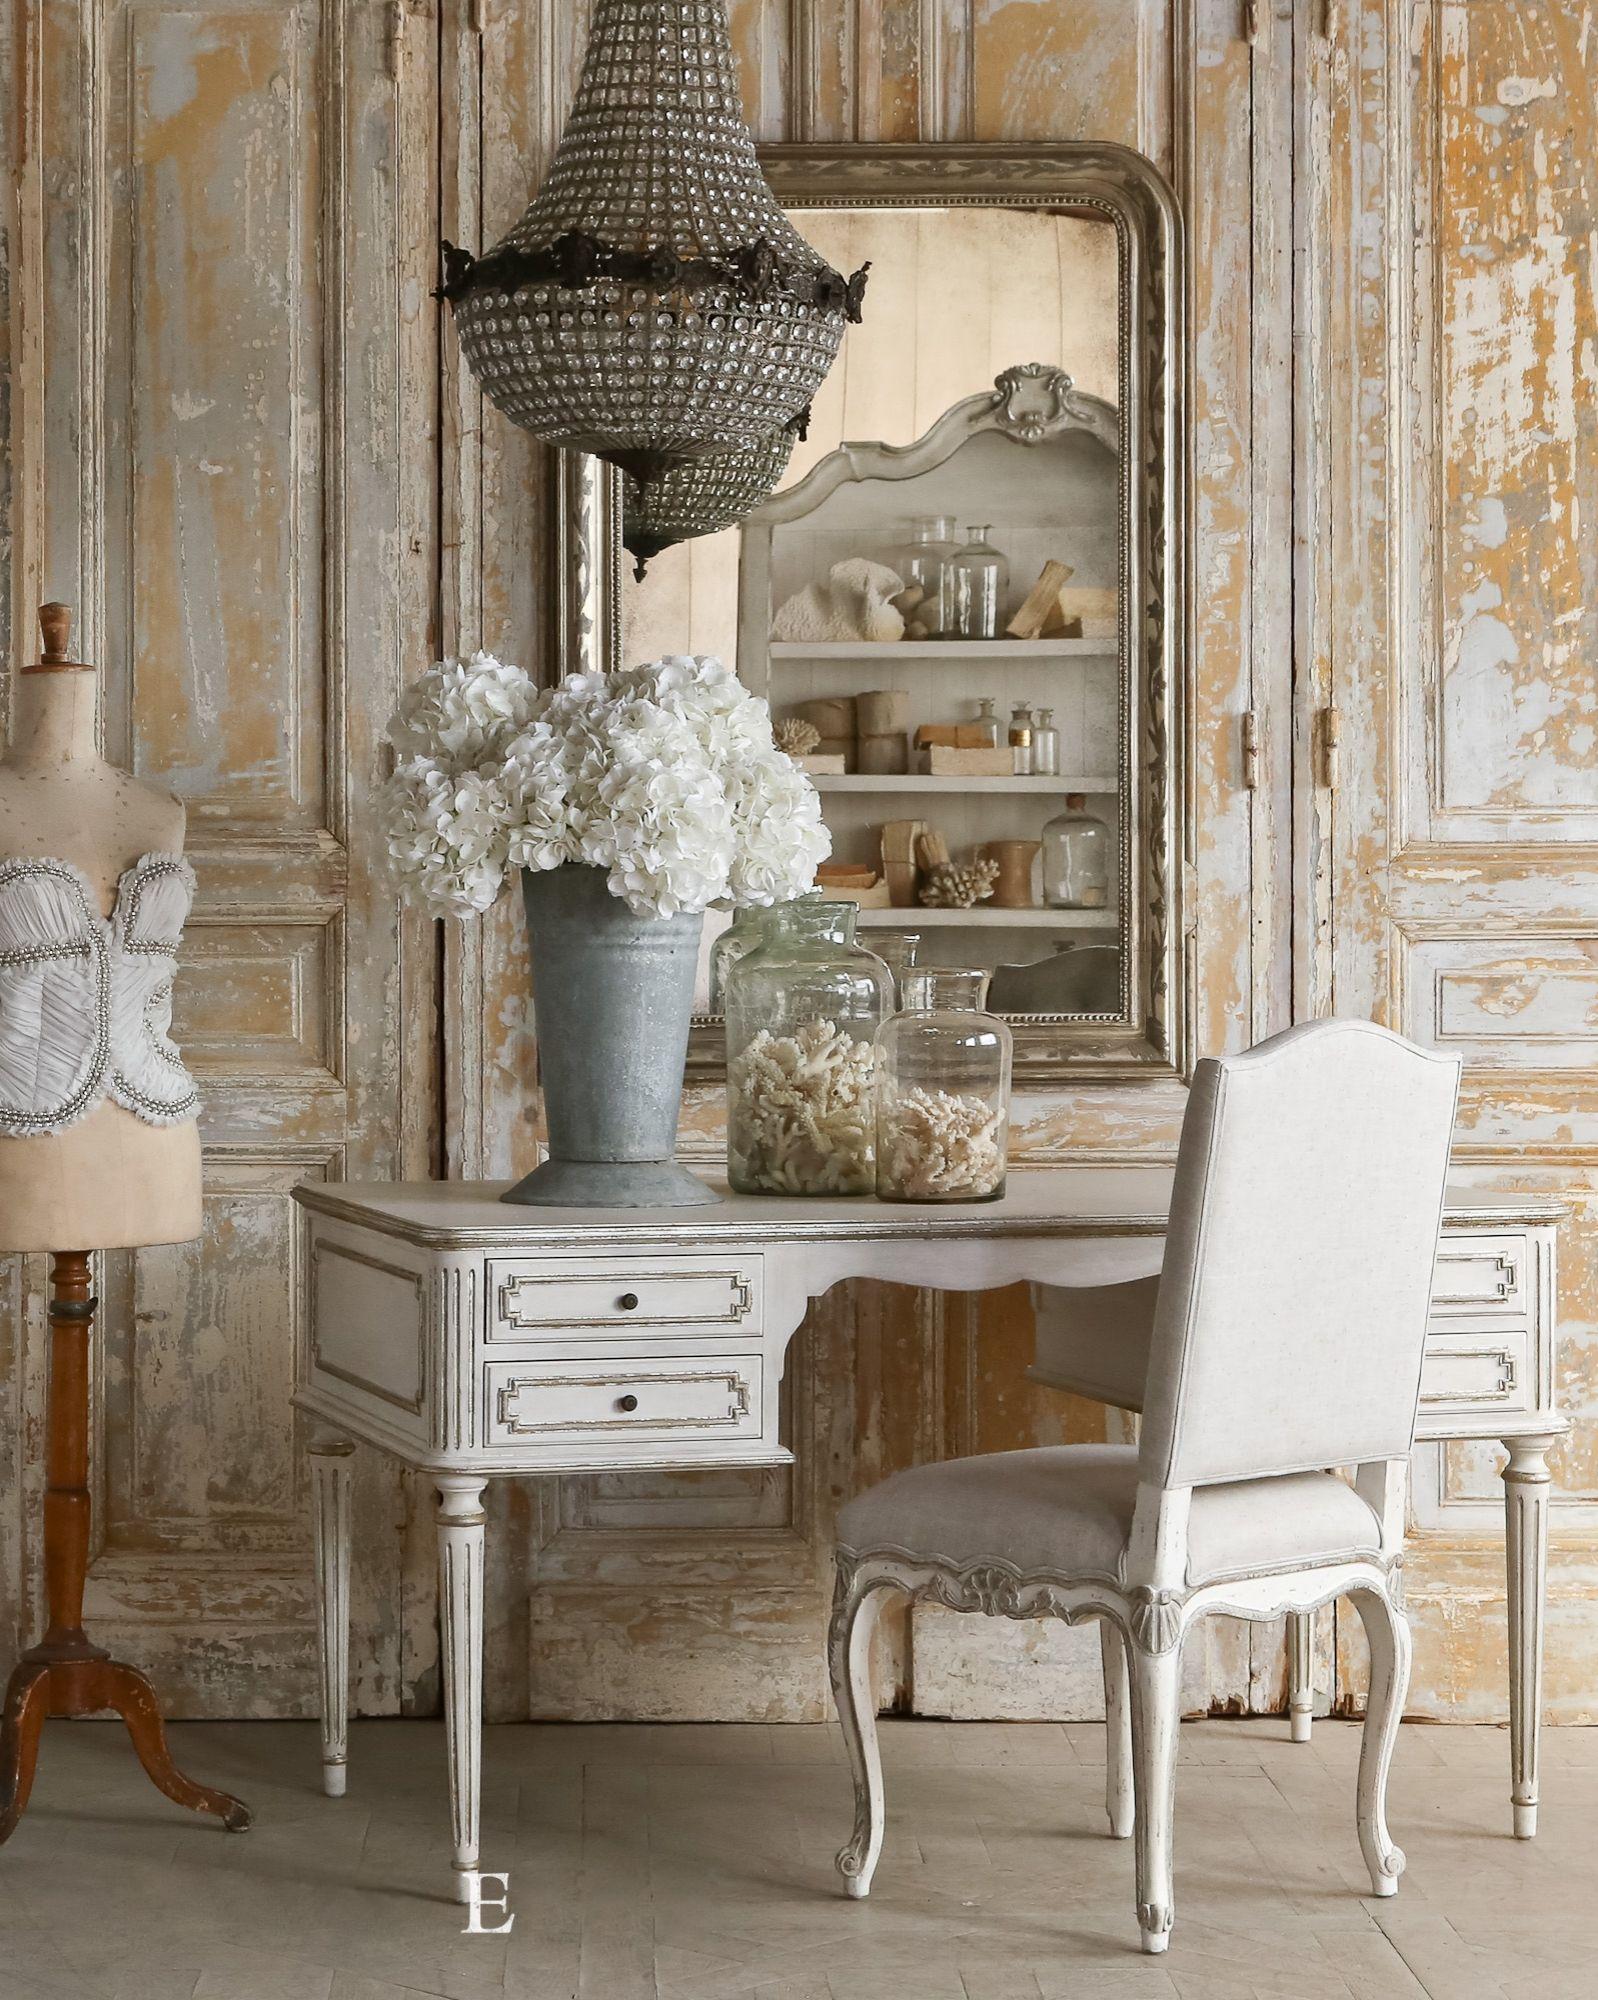 charming shabby chic french style design decoratin pinterest heilpraktiker vintage deko. Black Bedroom Furniture Sets. Home Design Ideas